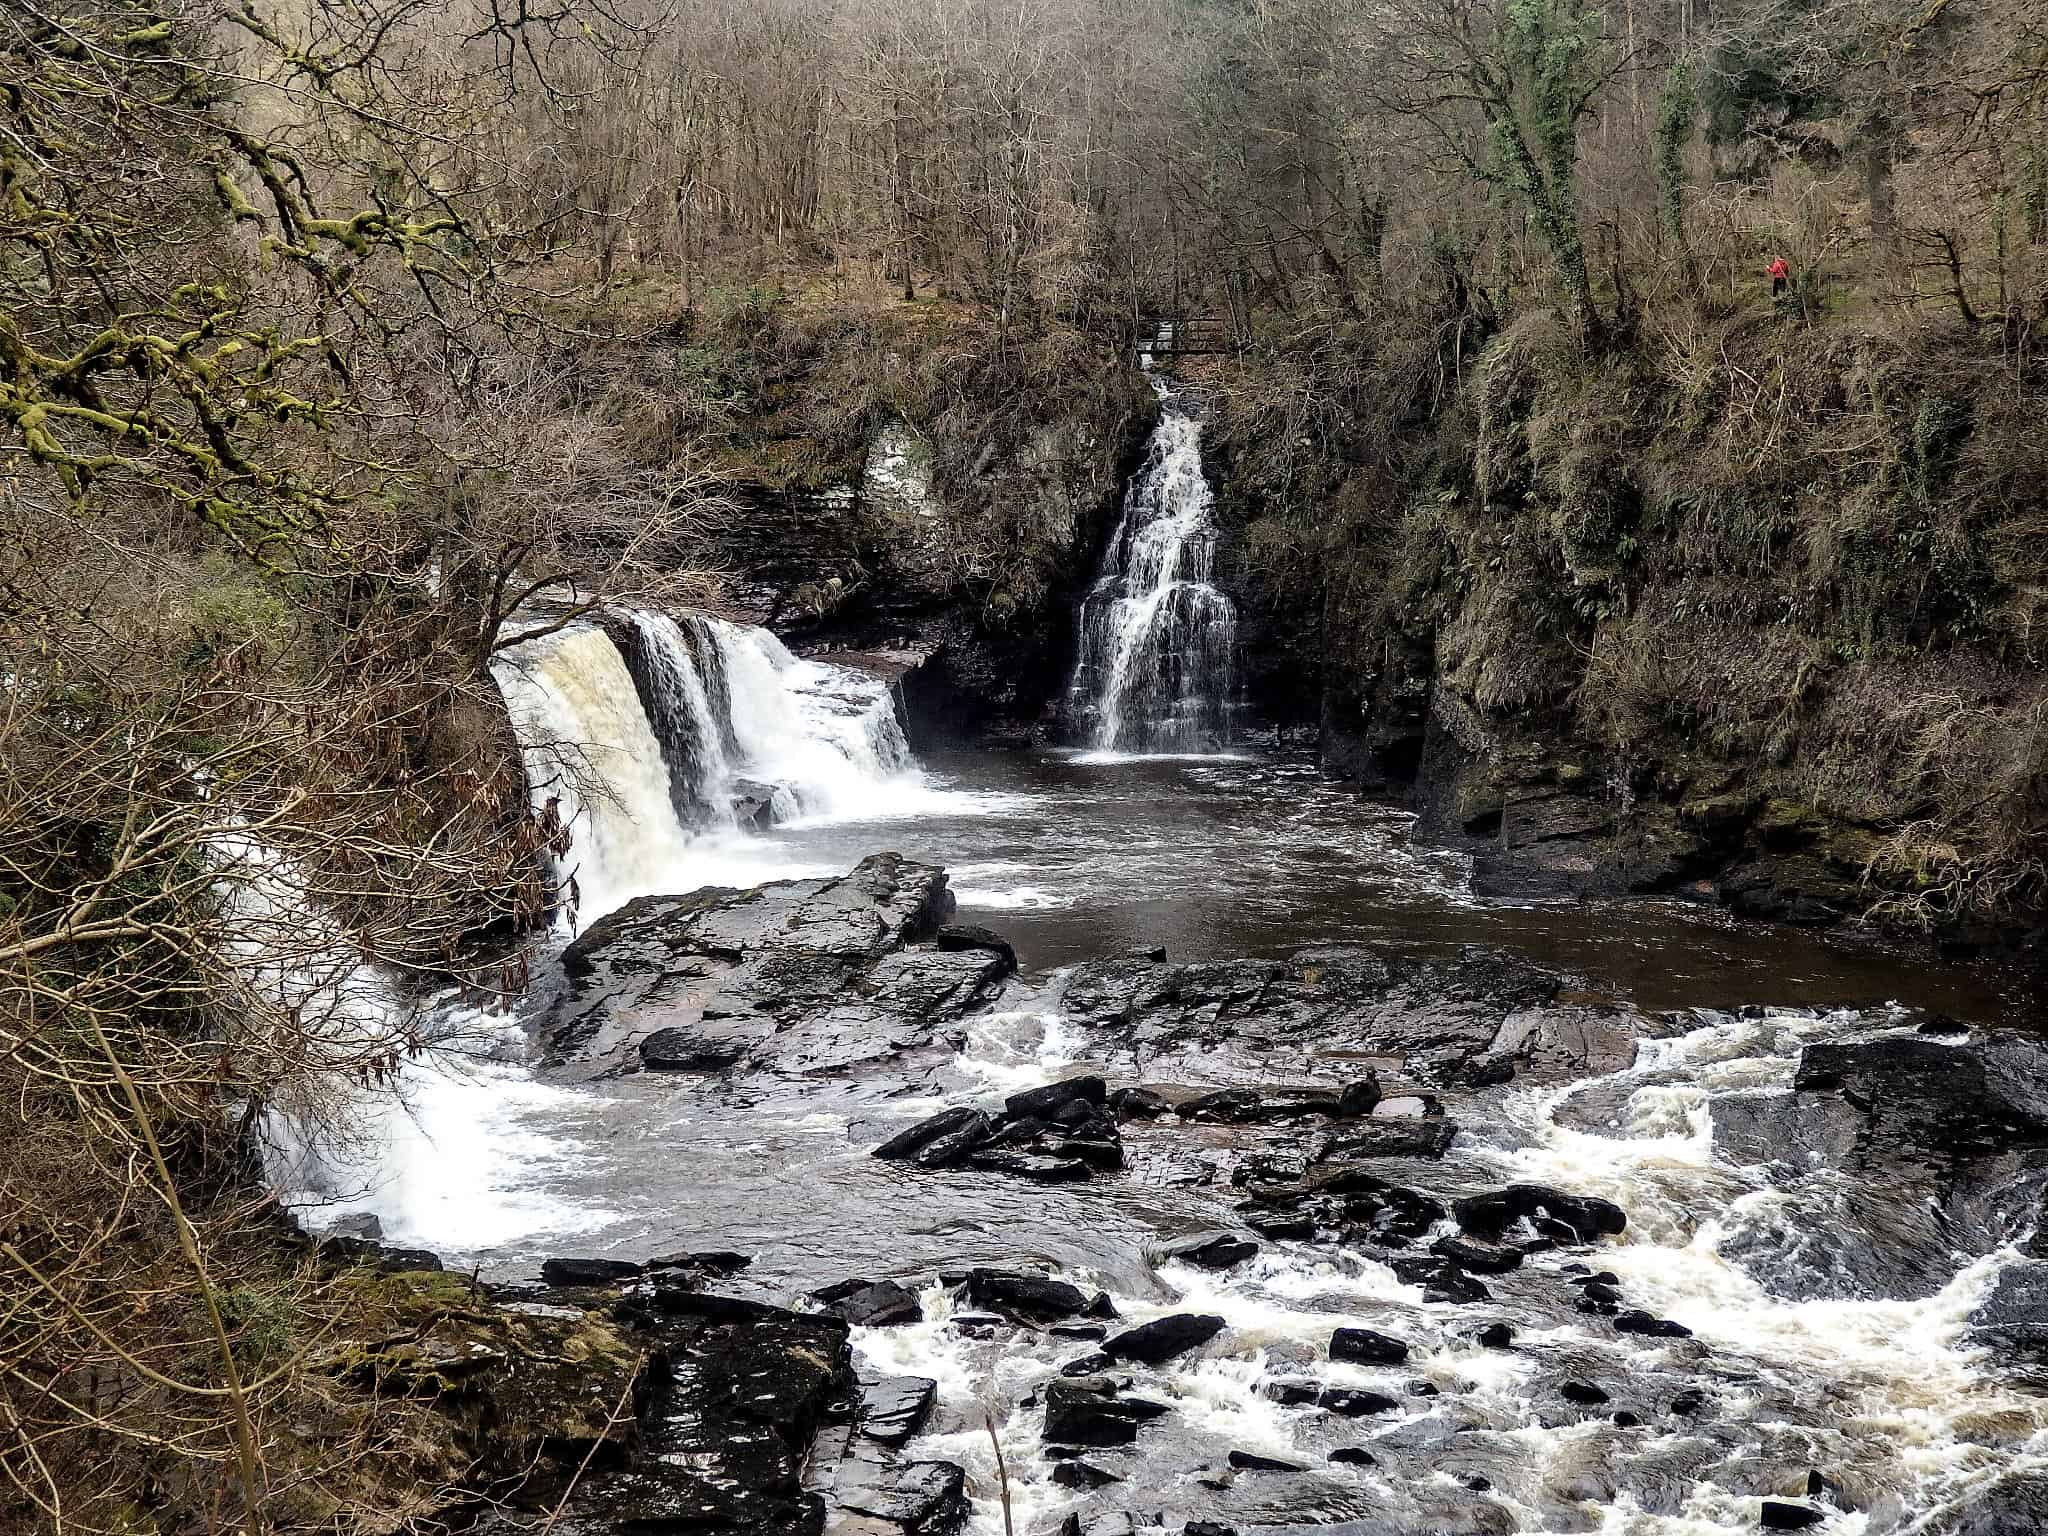 New Lanark Falls of Clyde